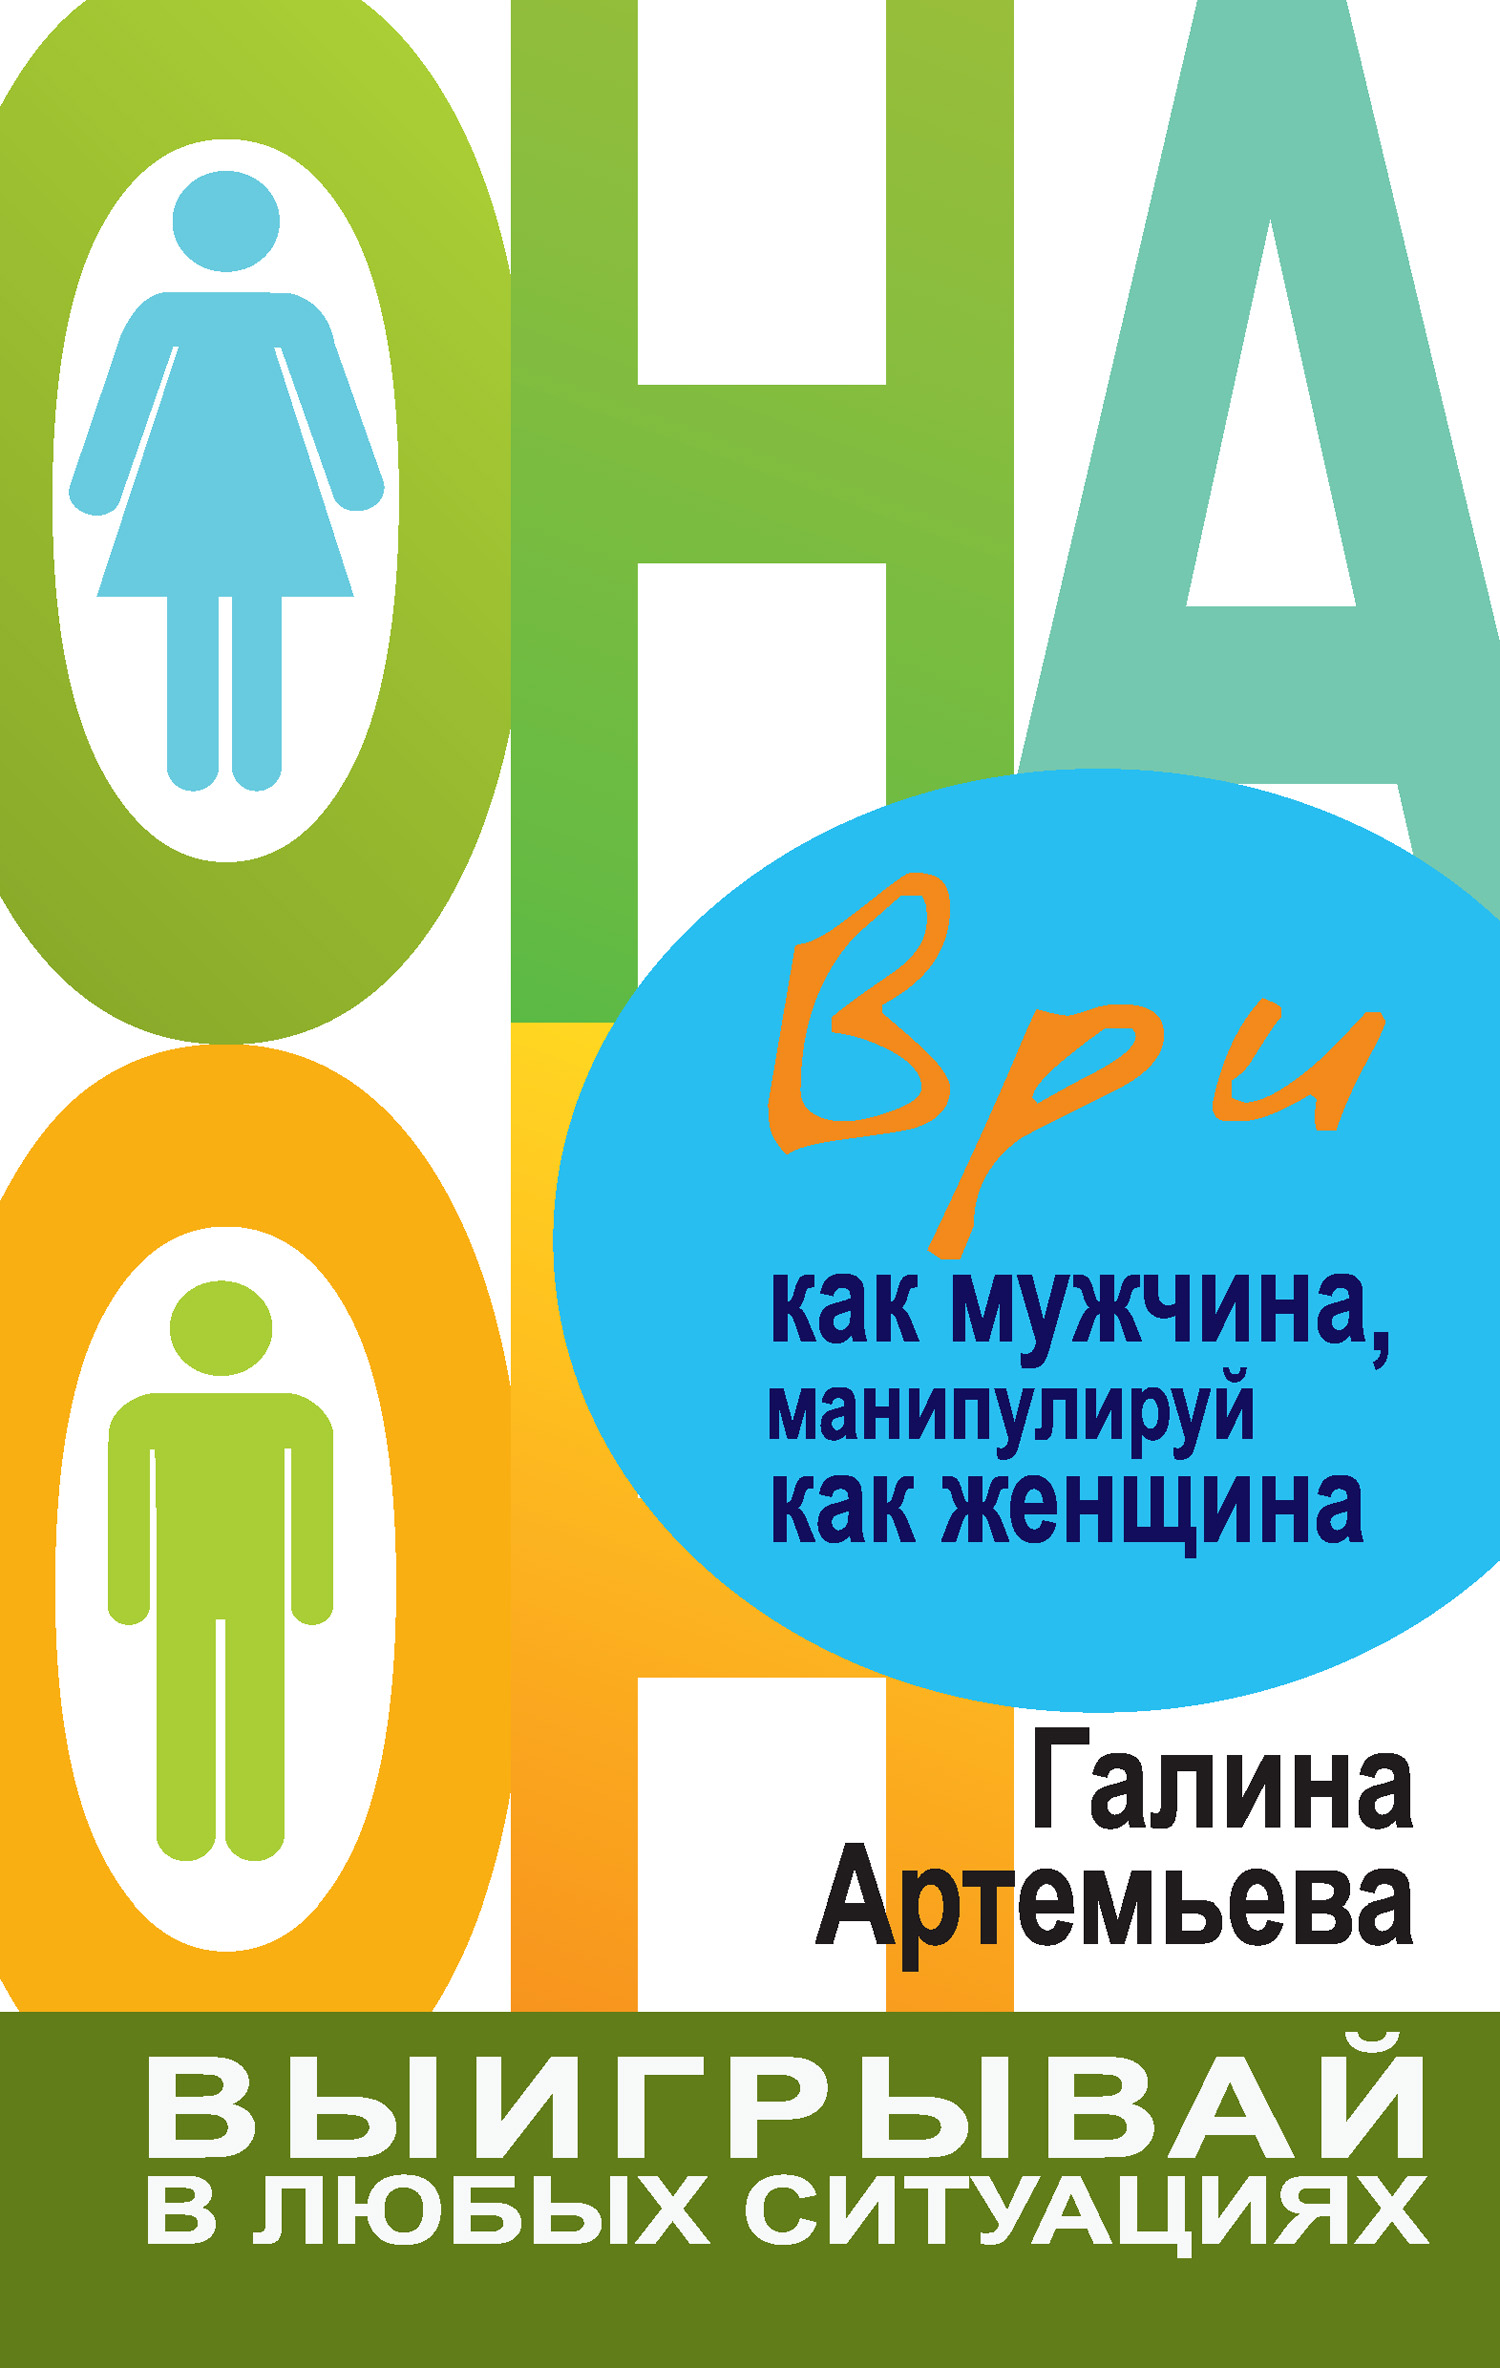 Галина Артемьева Ври как мужчина, манипулируй как женщина